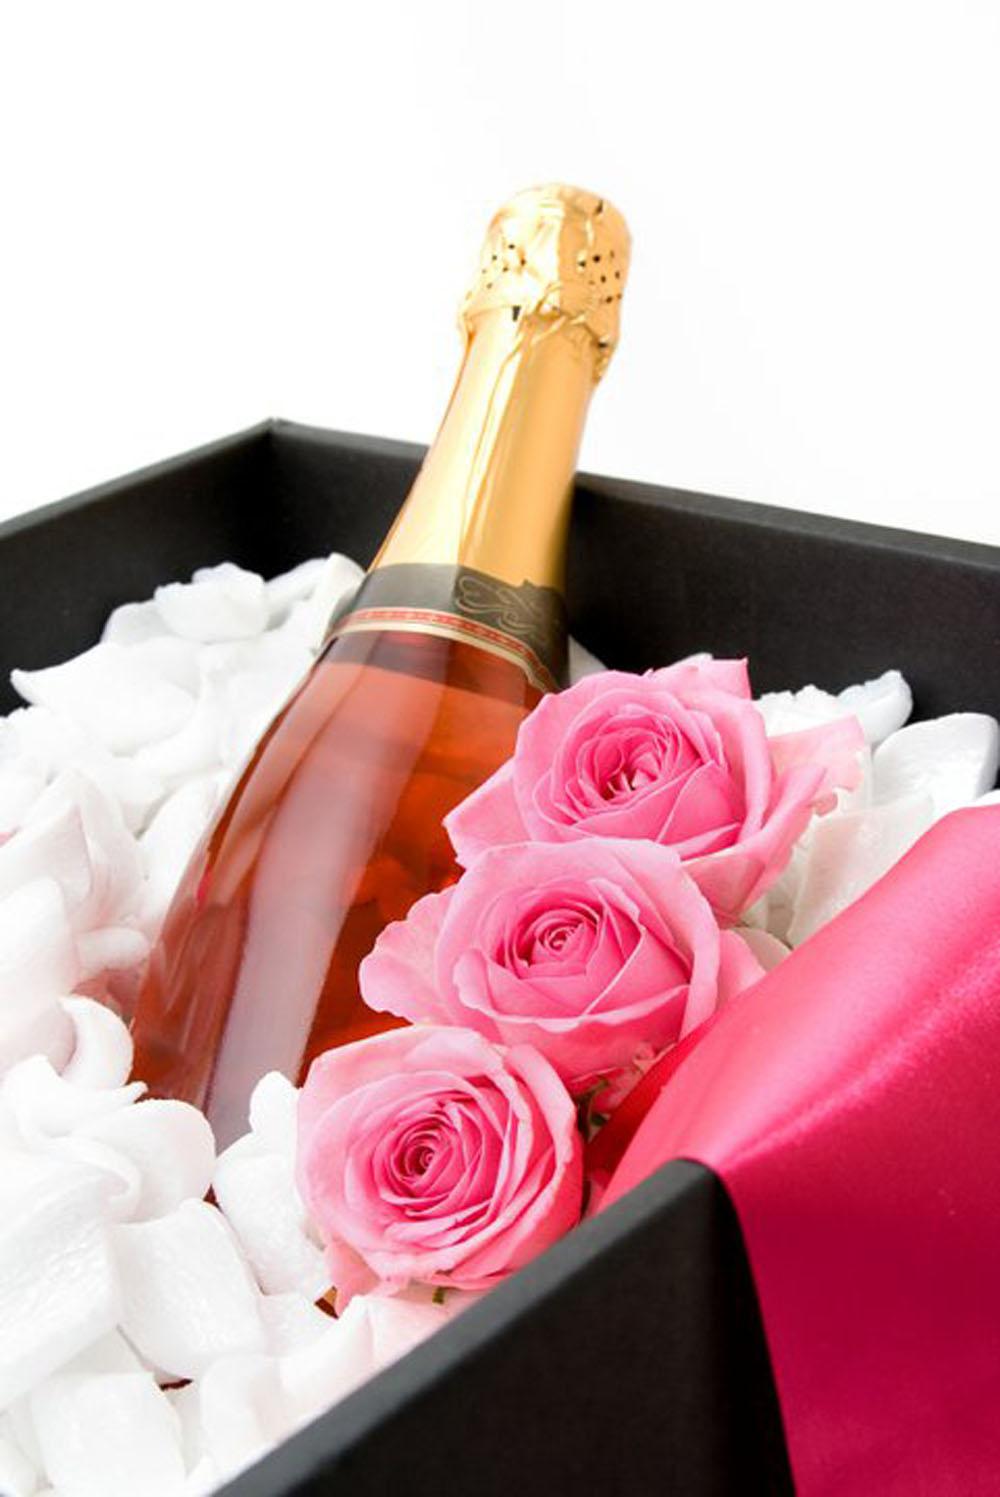 Rose Petals - gift box